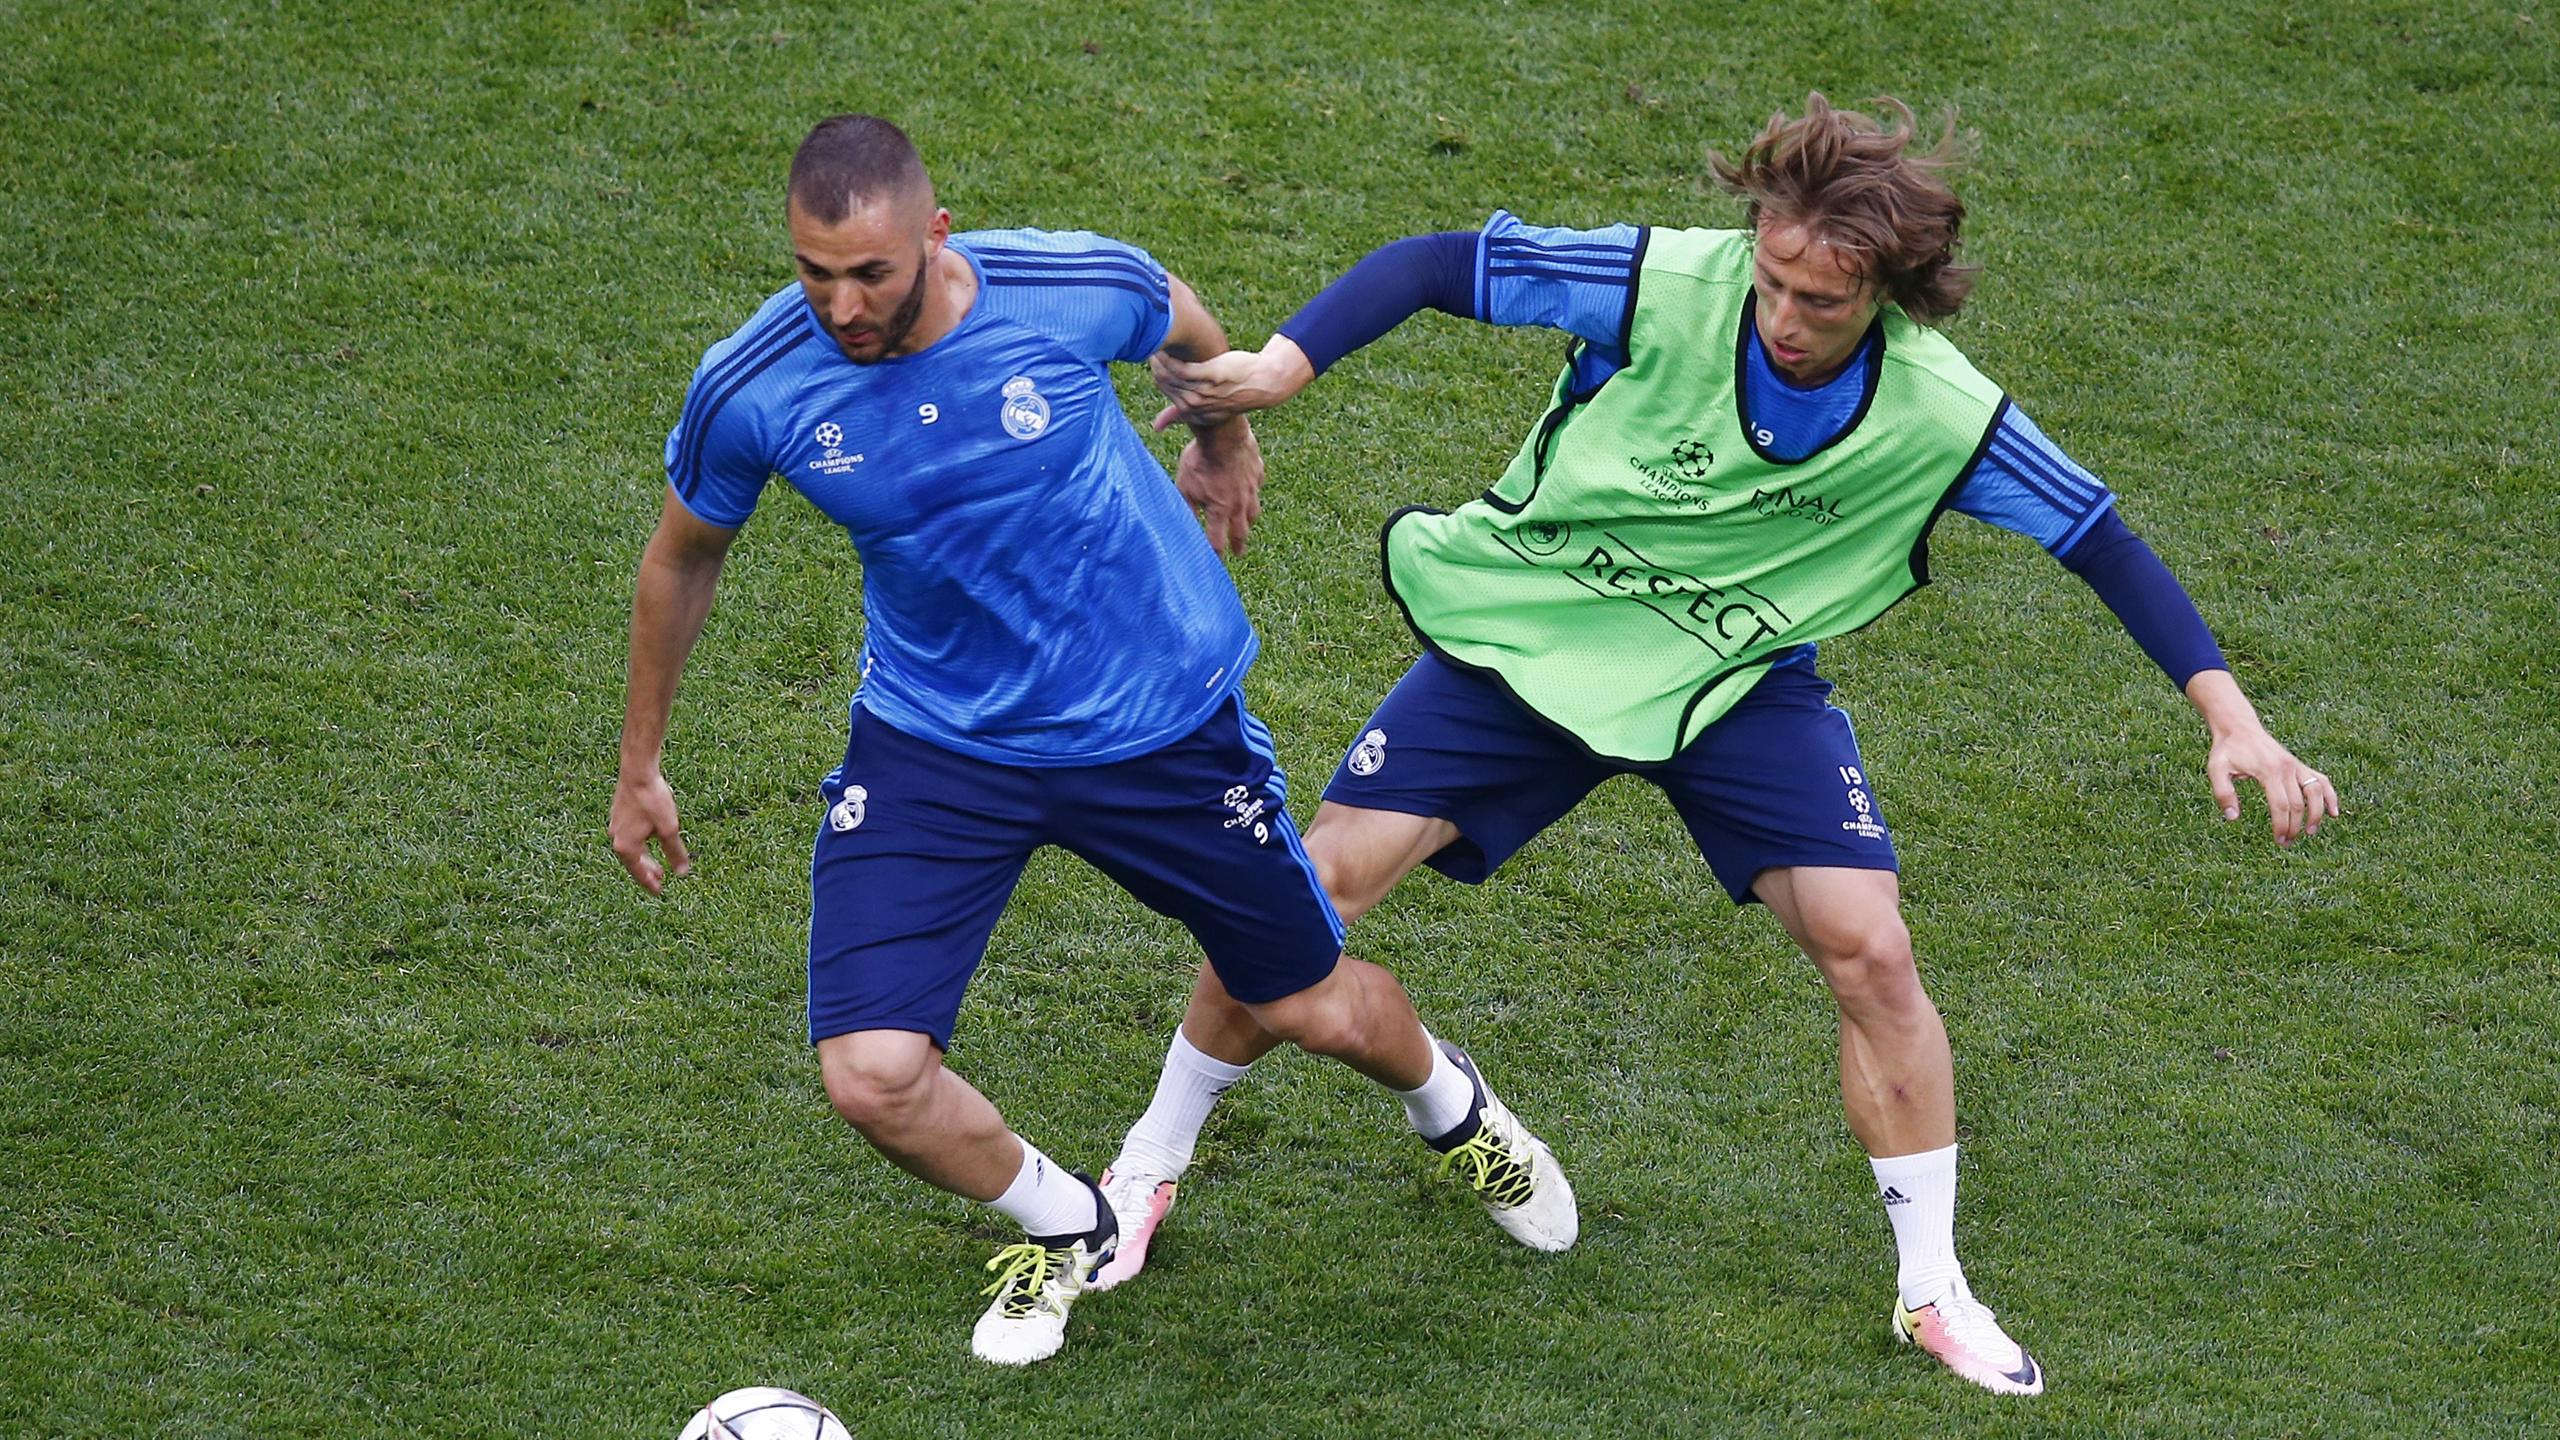 Real Madrid's Karim Benzema and Luka Modric during training